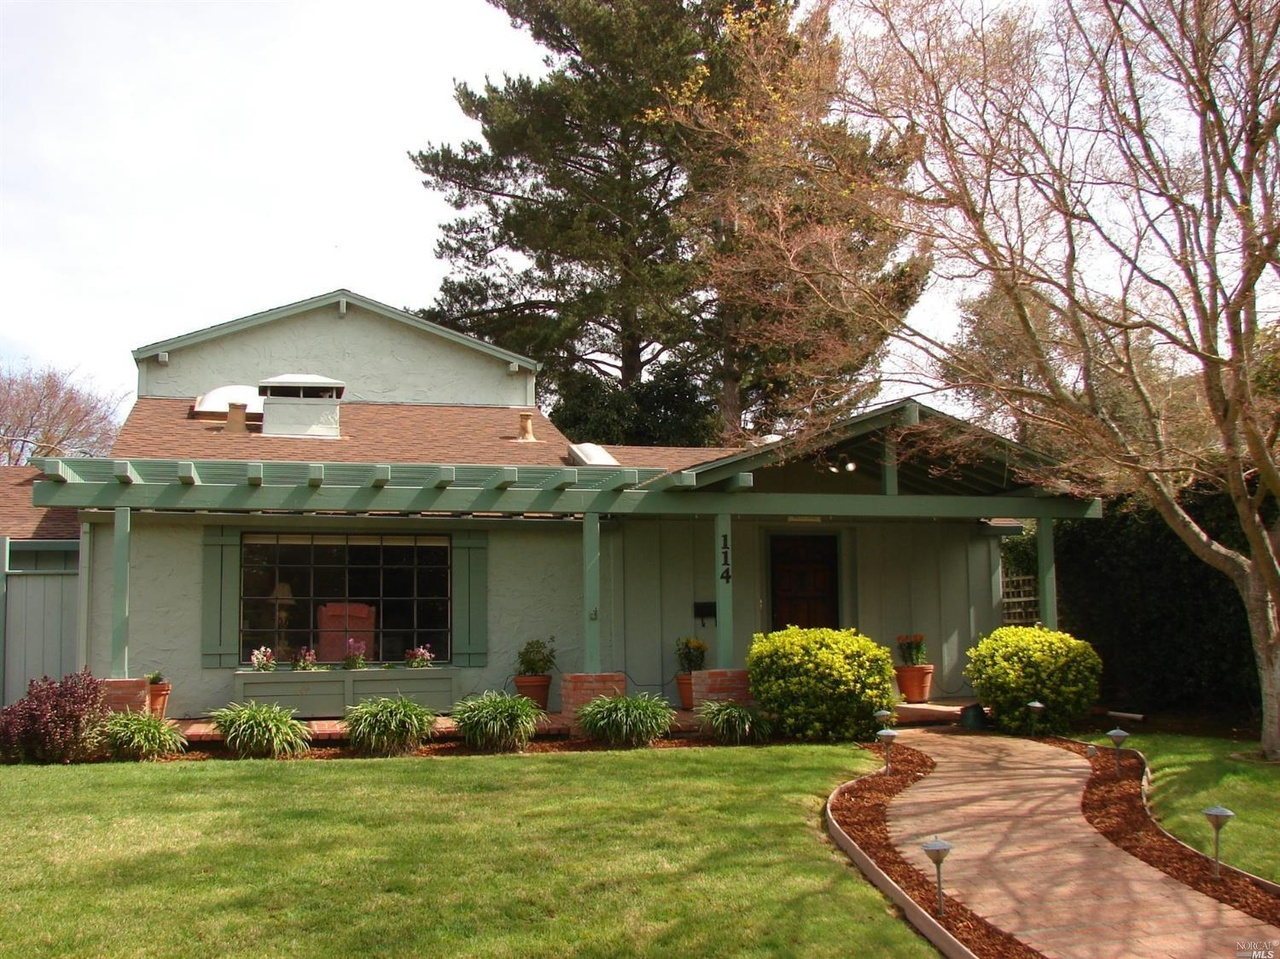 114 Acacia Ave, Napa, CA 94558 | MLS# 21805689 | Redfin